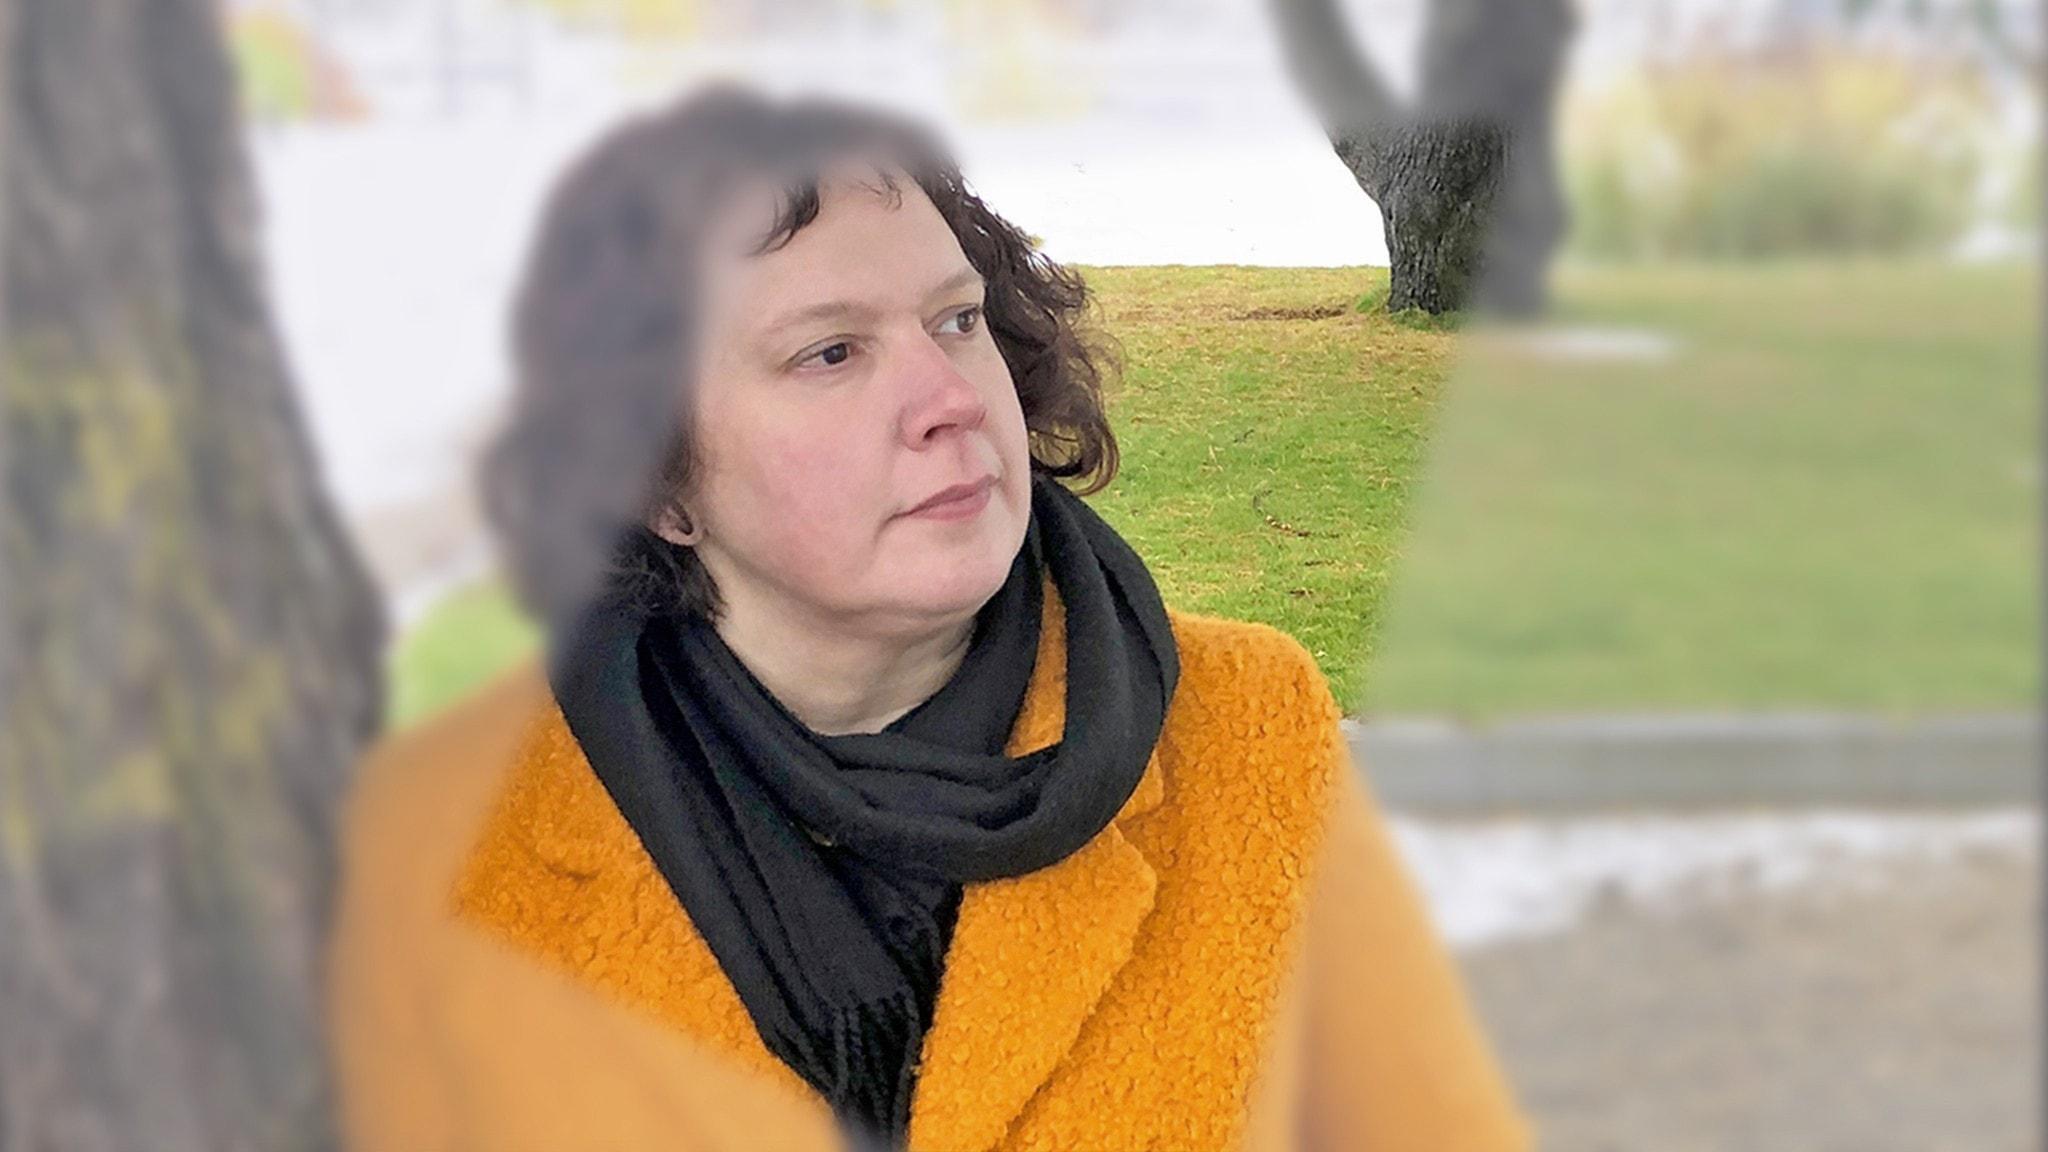 Anna-Mia Johansson i gul kappa vid ett träd